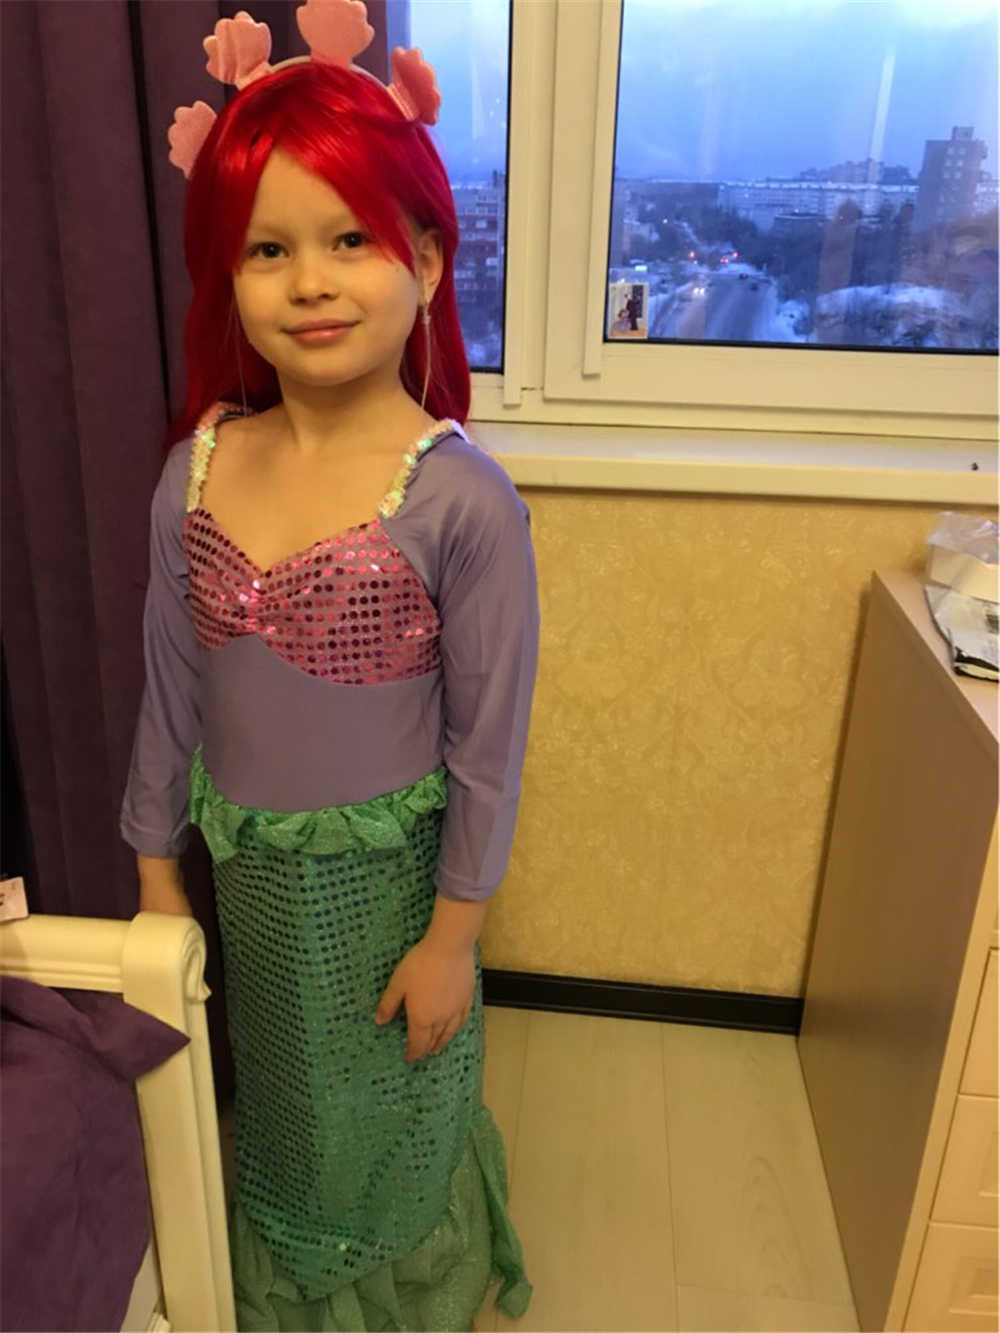 2d552cb90 ... Children's Little Mermaid Princess Dress for Girl Clothing Child Girls  Summer Beach Party Dress + Headband ...